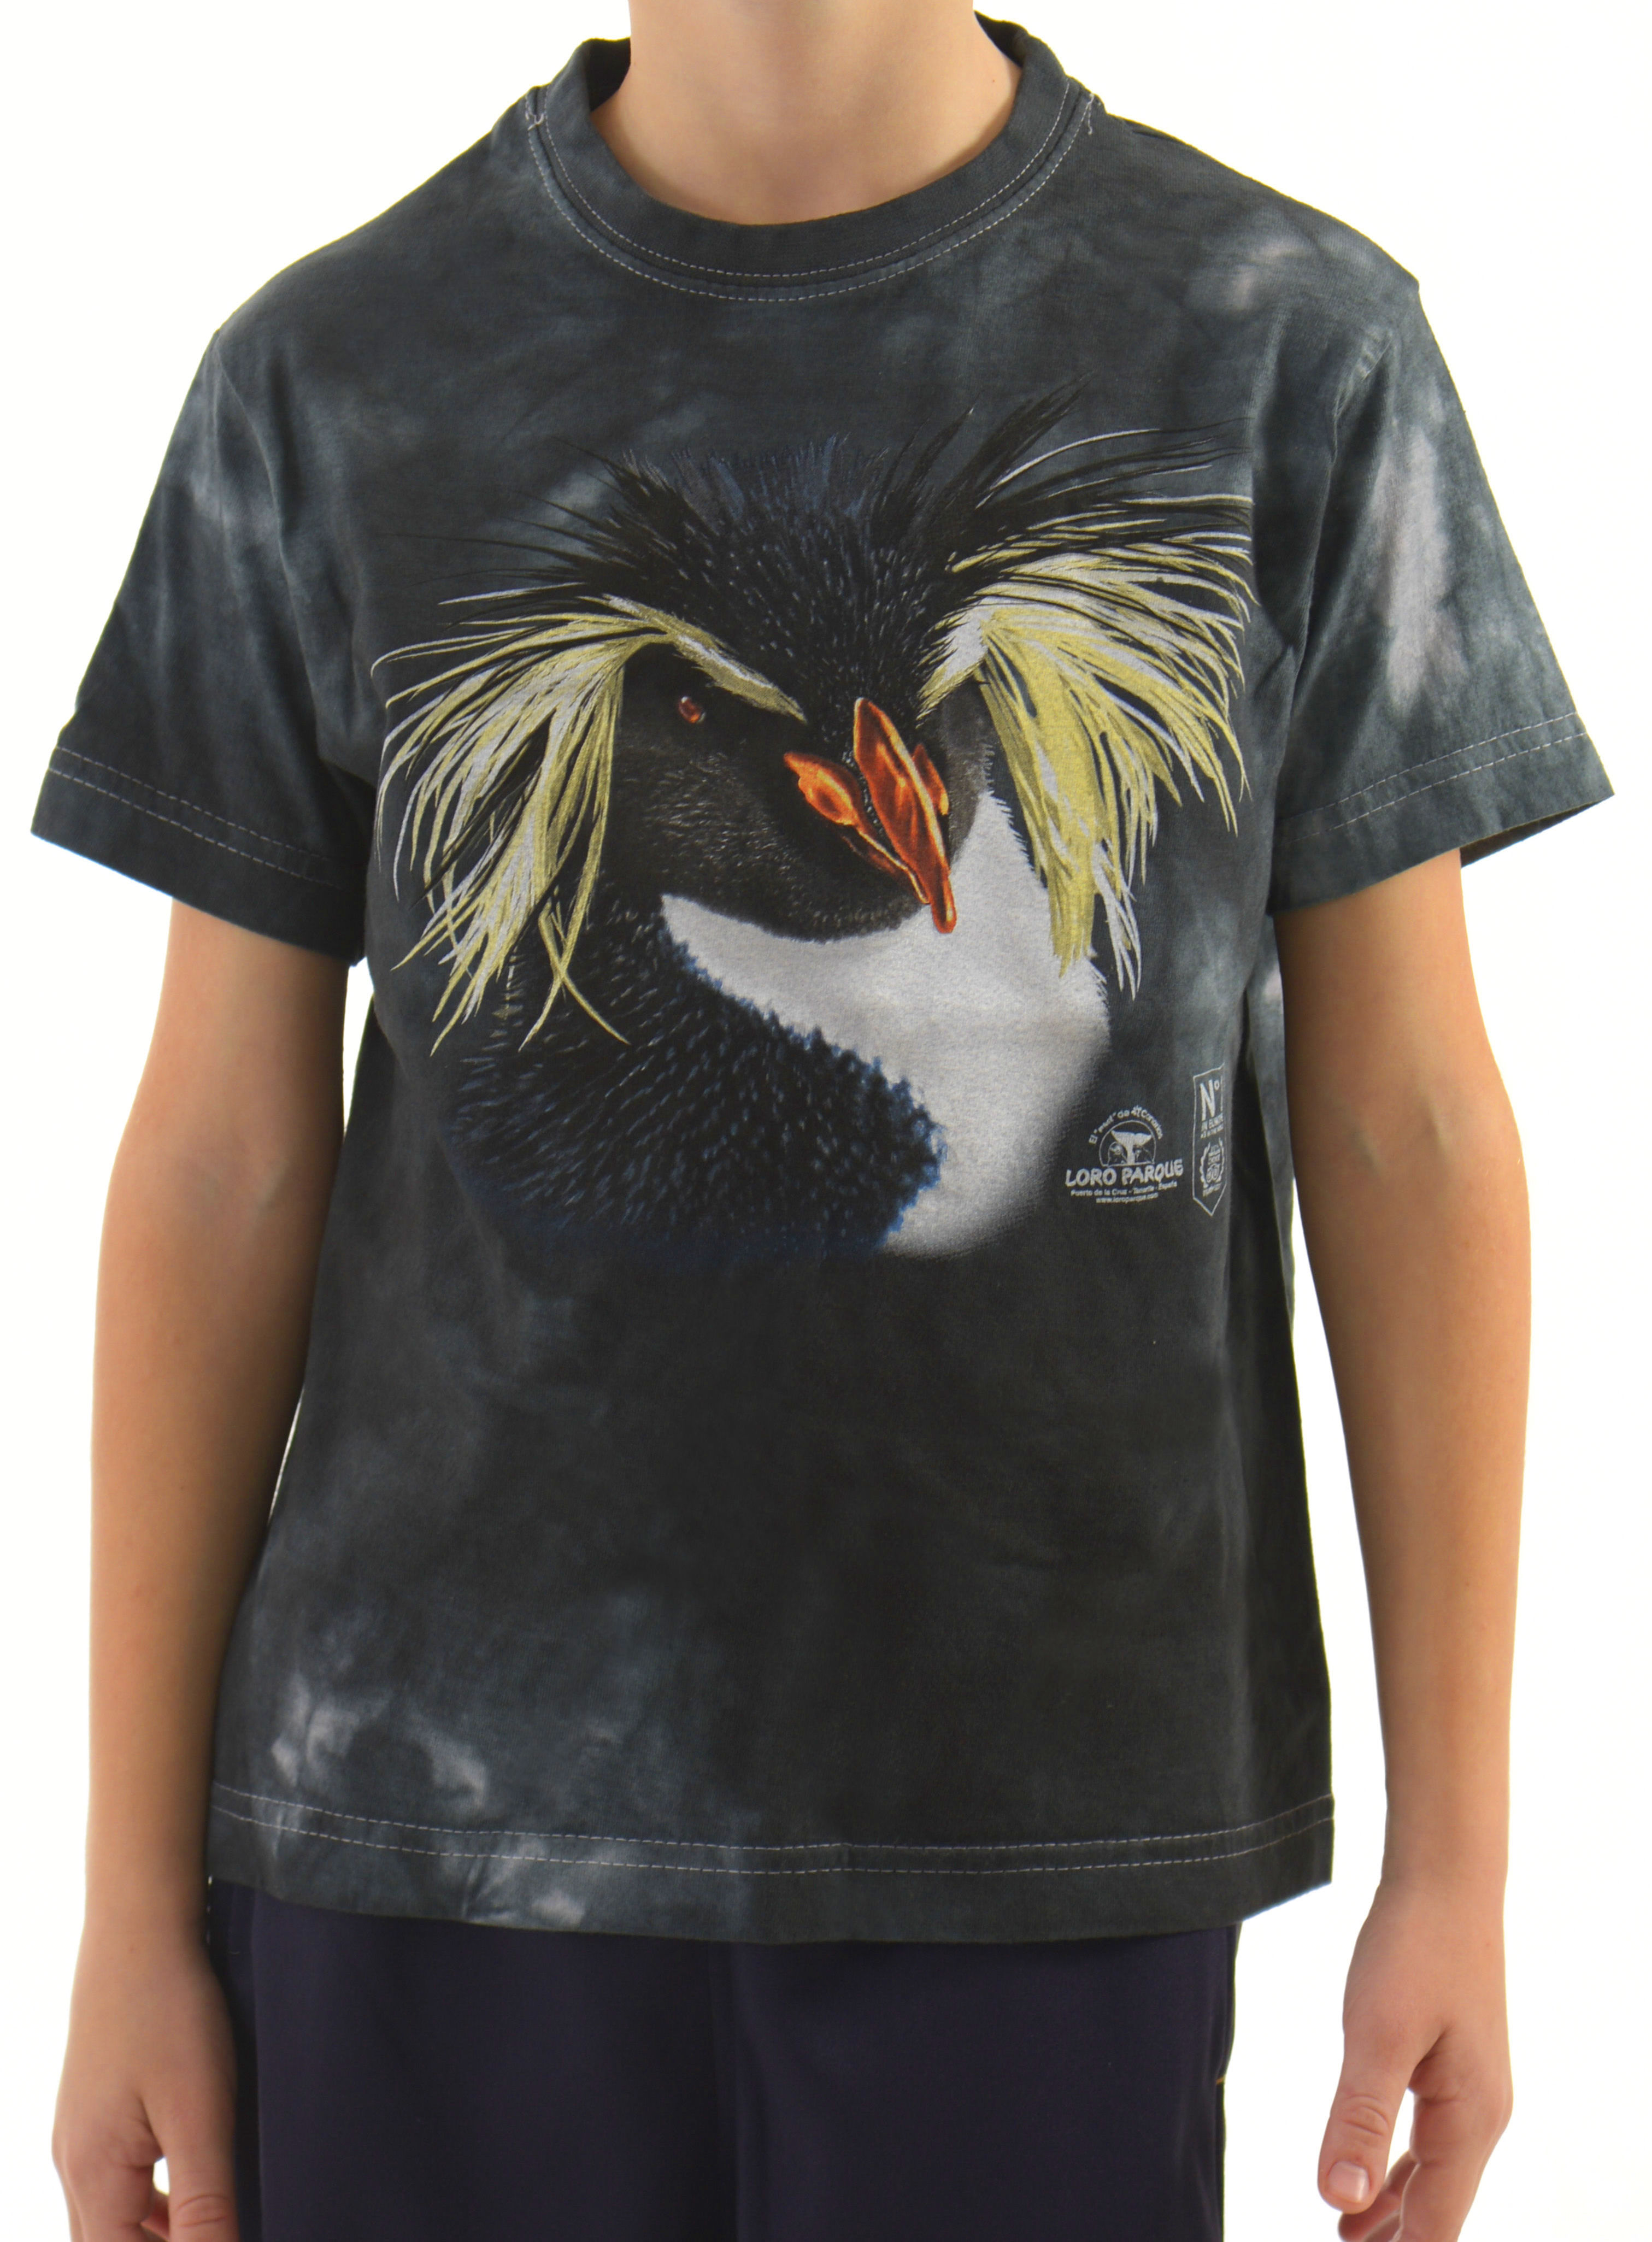 Camiseta Niño/Niña Saltaroca: Productos de BELLA TRADICION